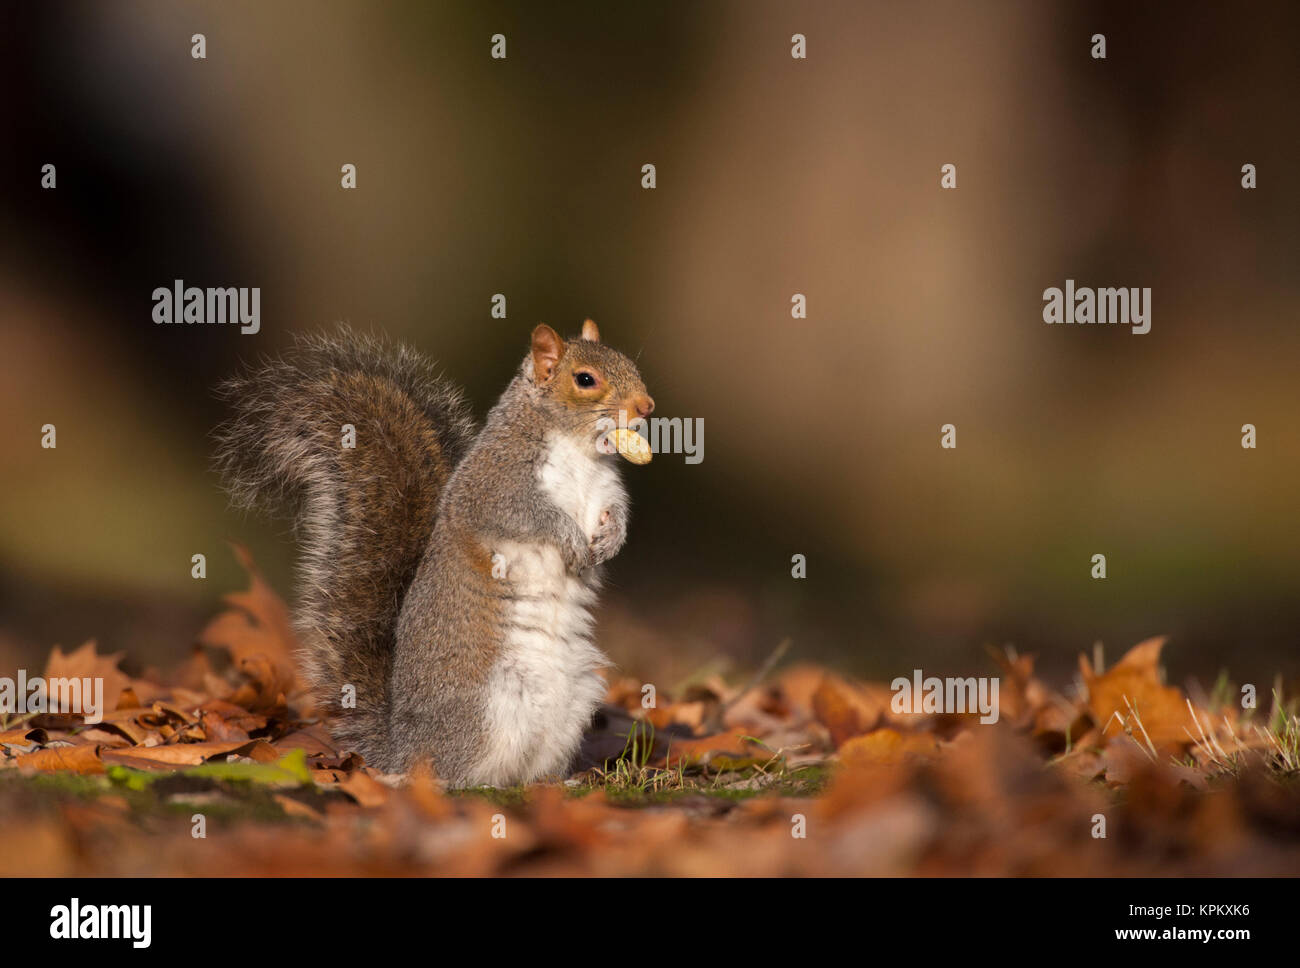 Grey Squirrel or Eastern Gray squirrel, (Sciurus carolinensis), Regents Park, London, United Kingdom Stock Photo